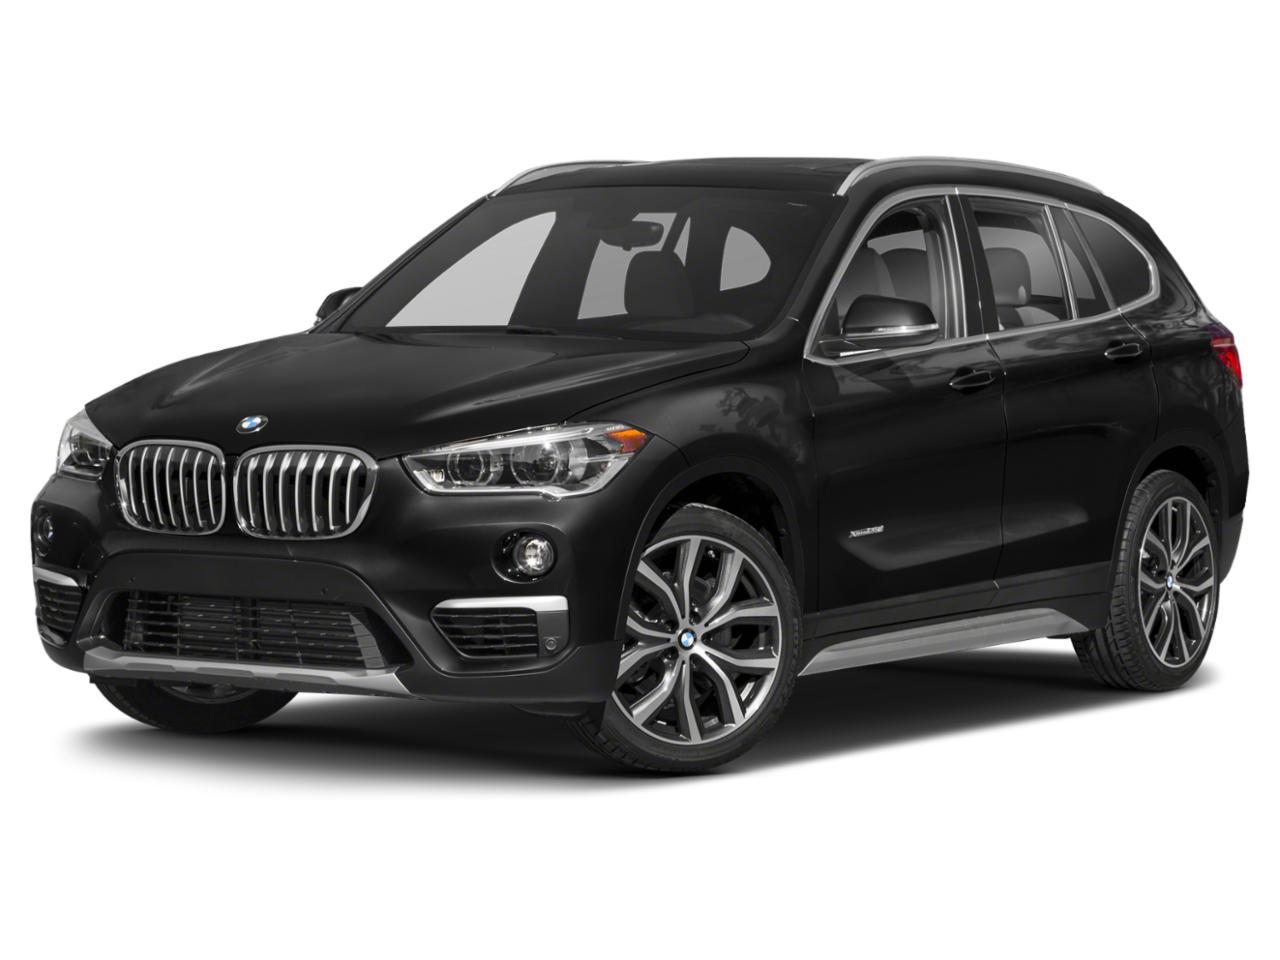 2019 BMW X1 sDrive28i Vehicle Photo in Odessa, TX 79762